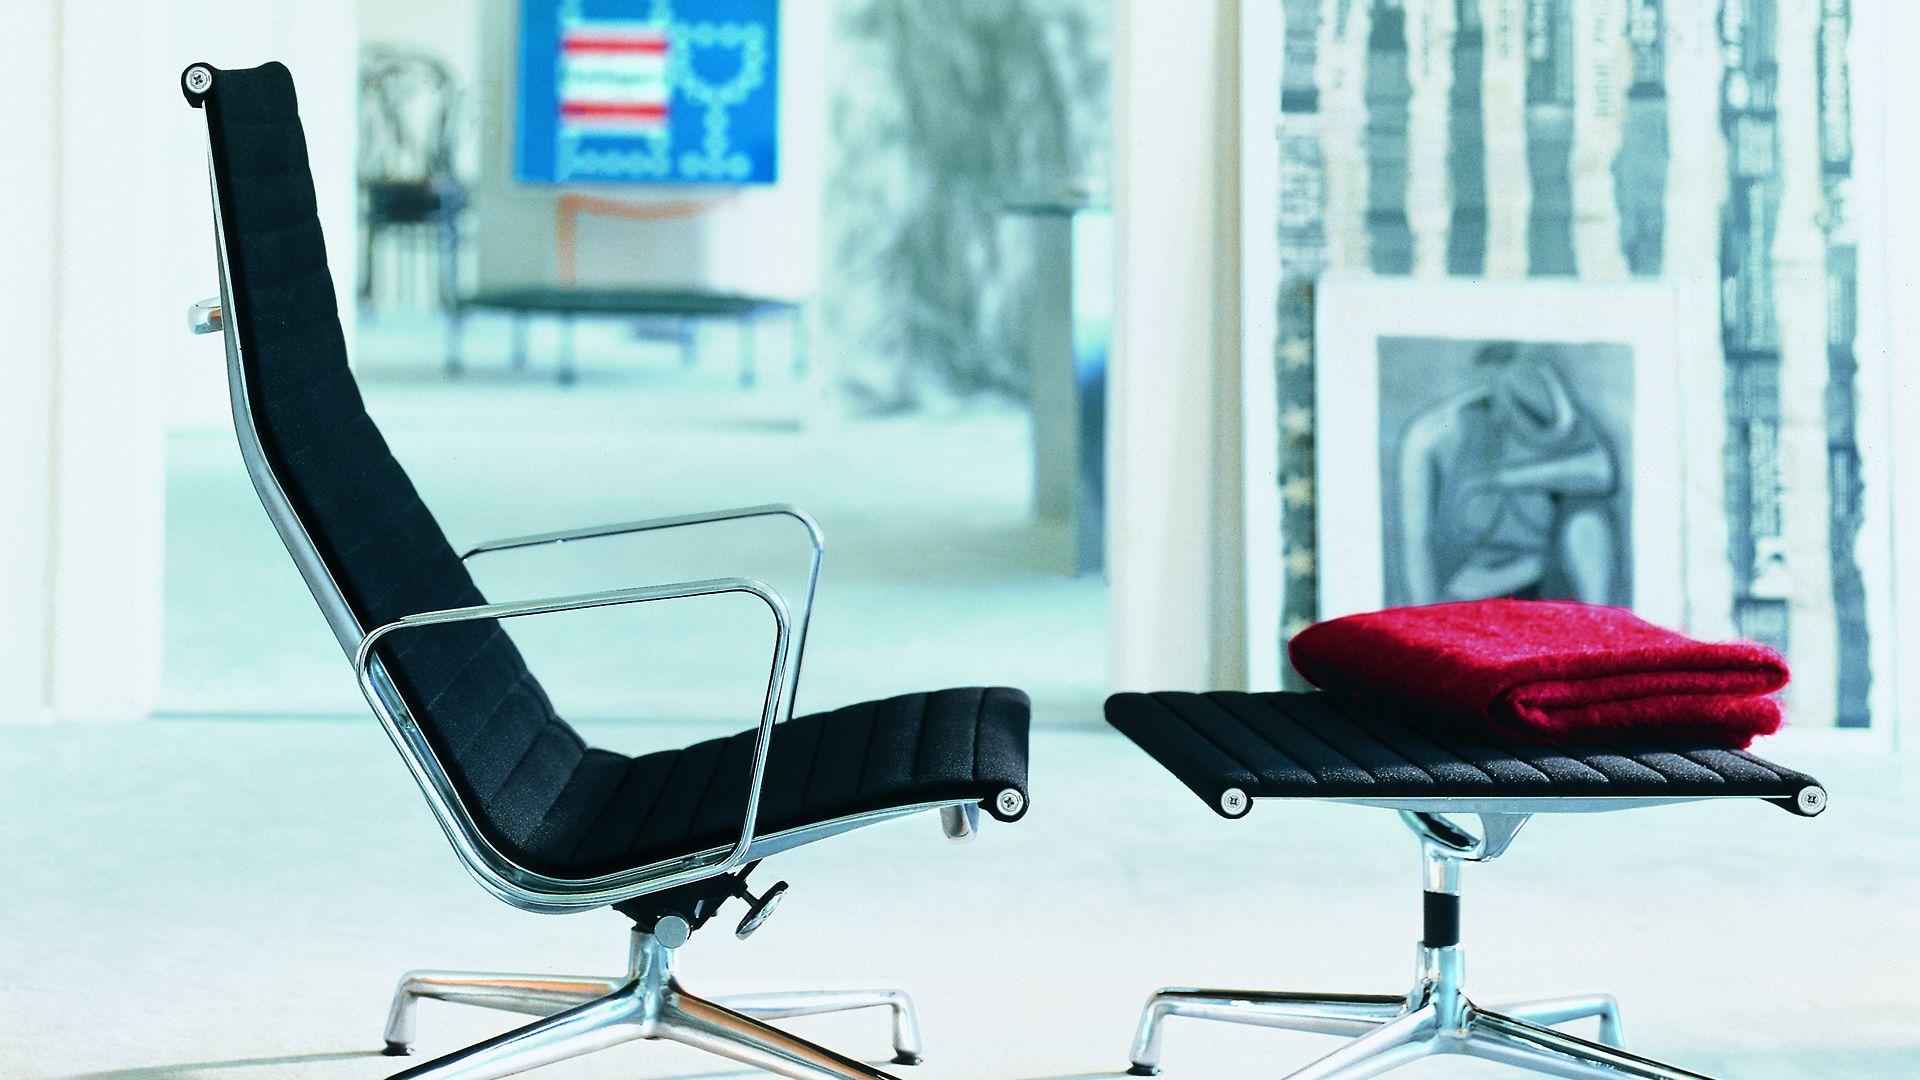 Vitra_Aluminium-Chair_Eames_EA-124